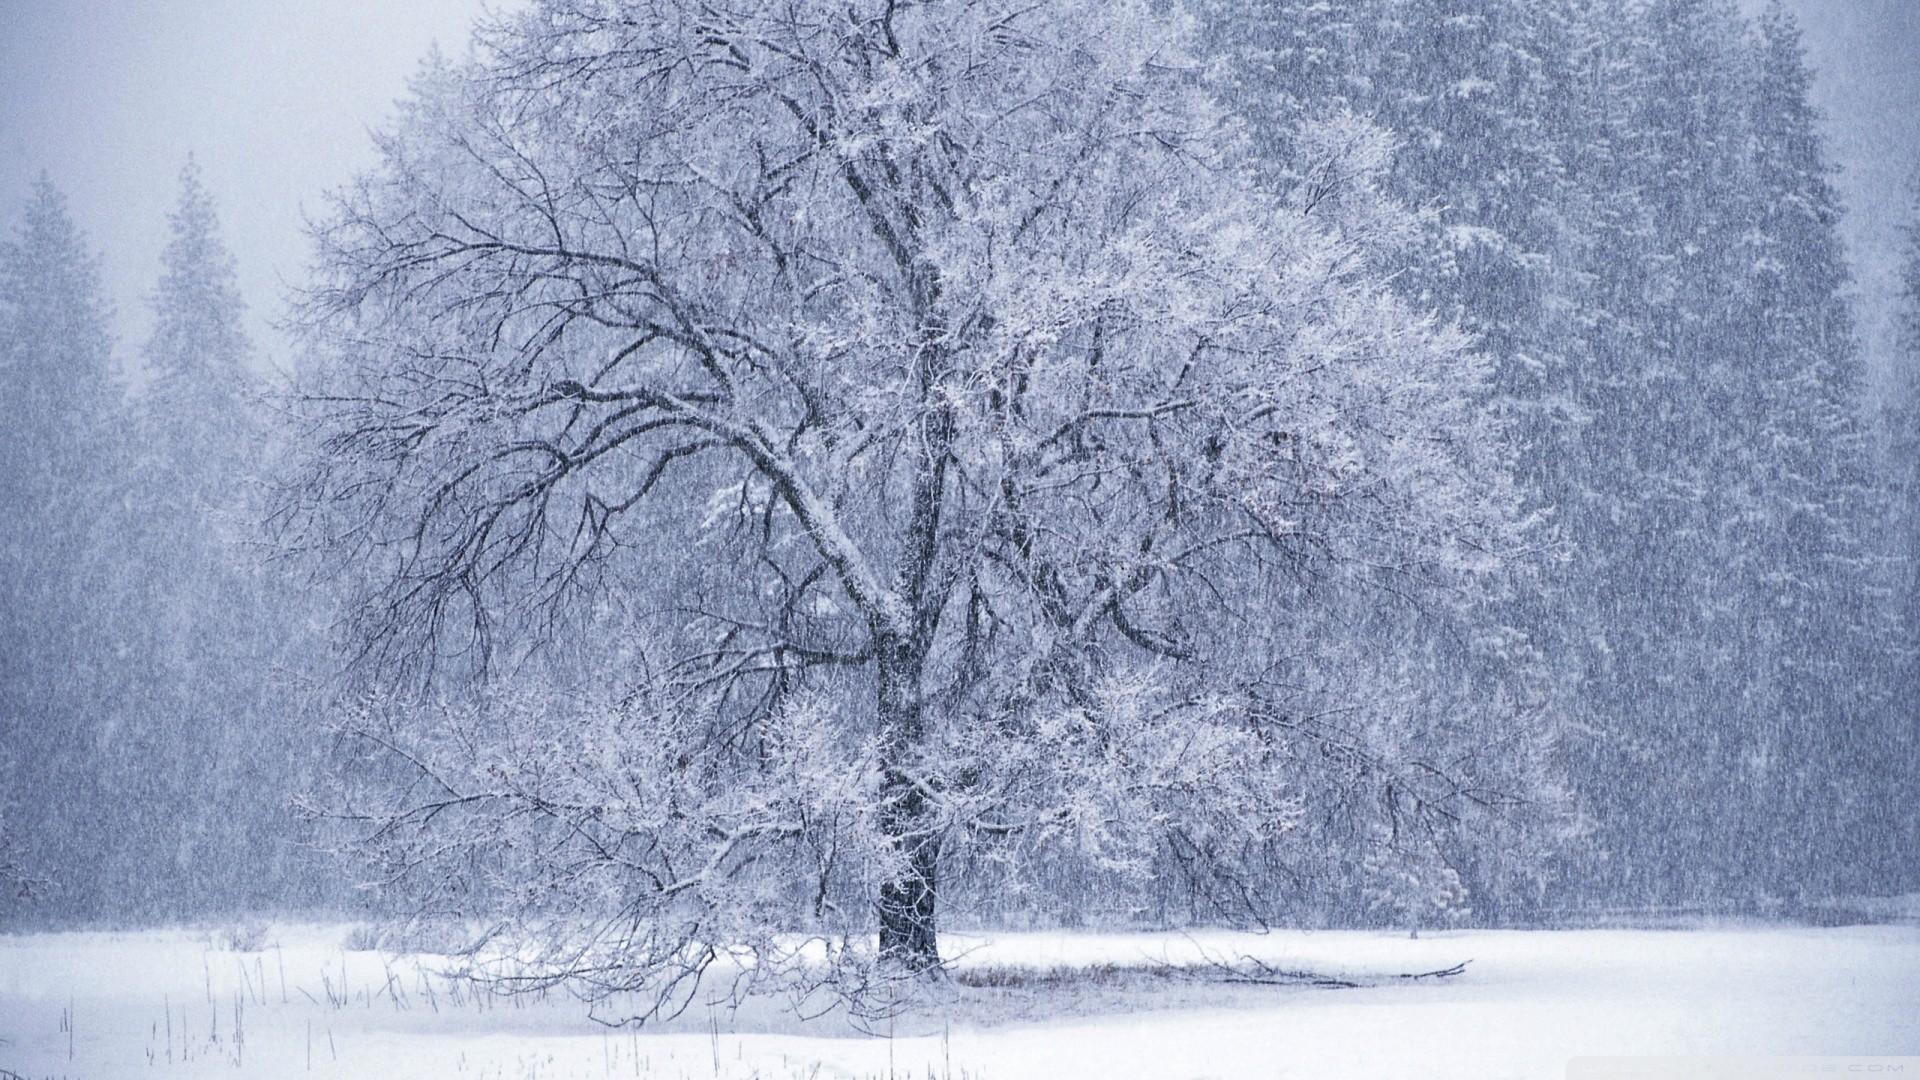 Res: 1920x1080, snow falling wallpaper